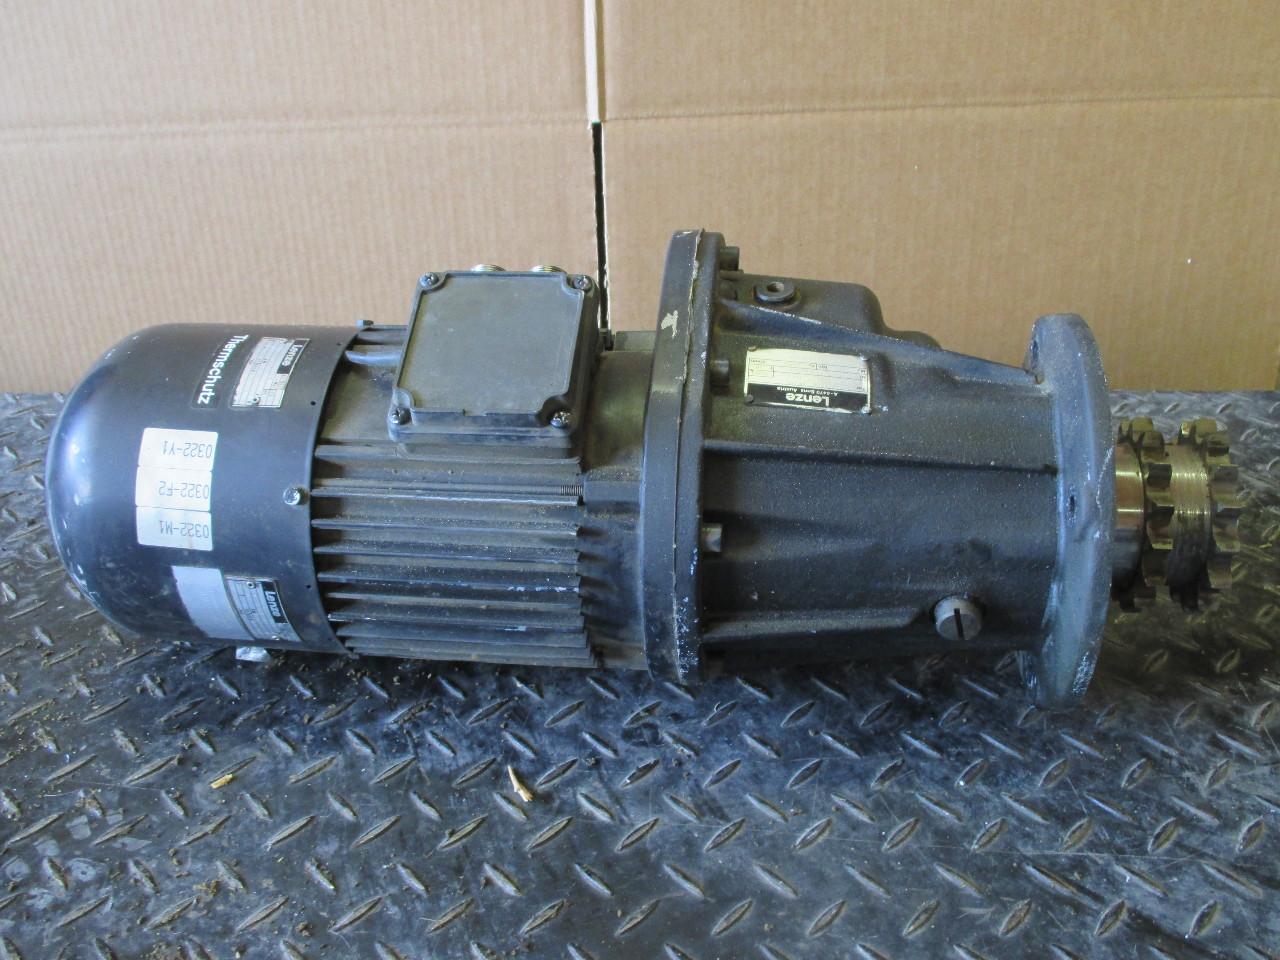 Lenze A 4470 Gear Box With Motor B9sfg42 005 H